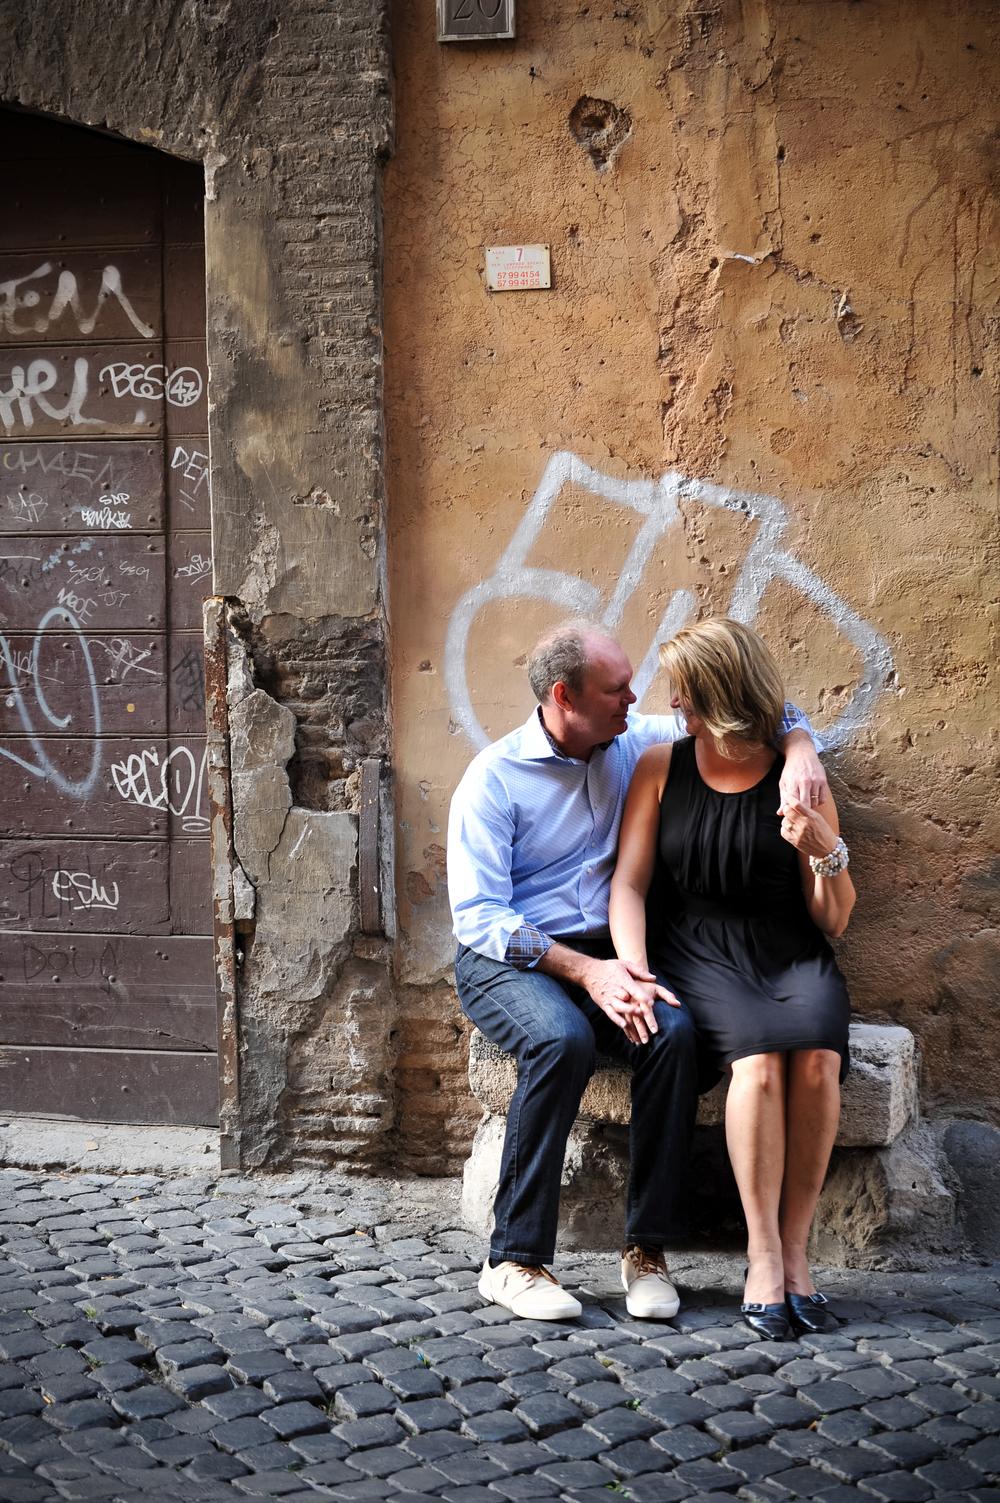 Rome Vacation Photographer - Siobhan - Flytographer